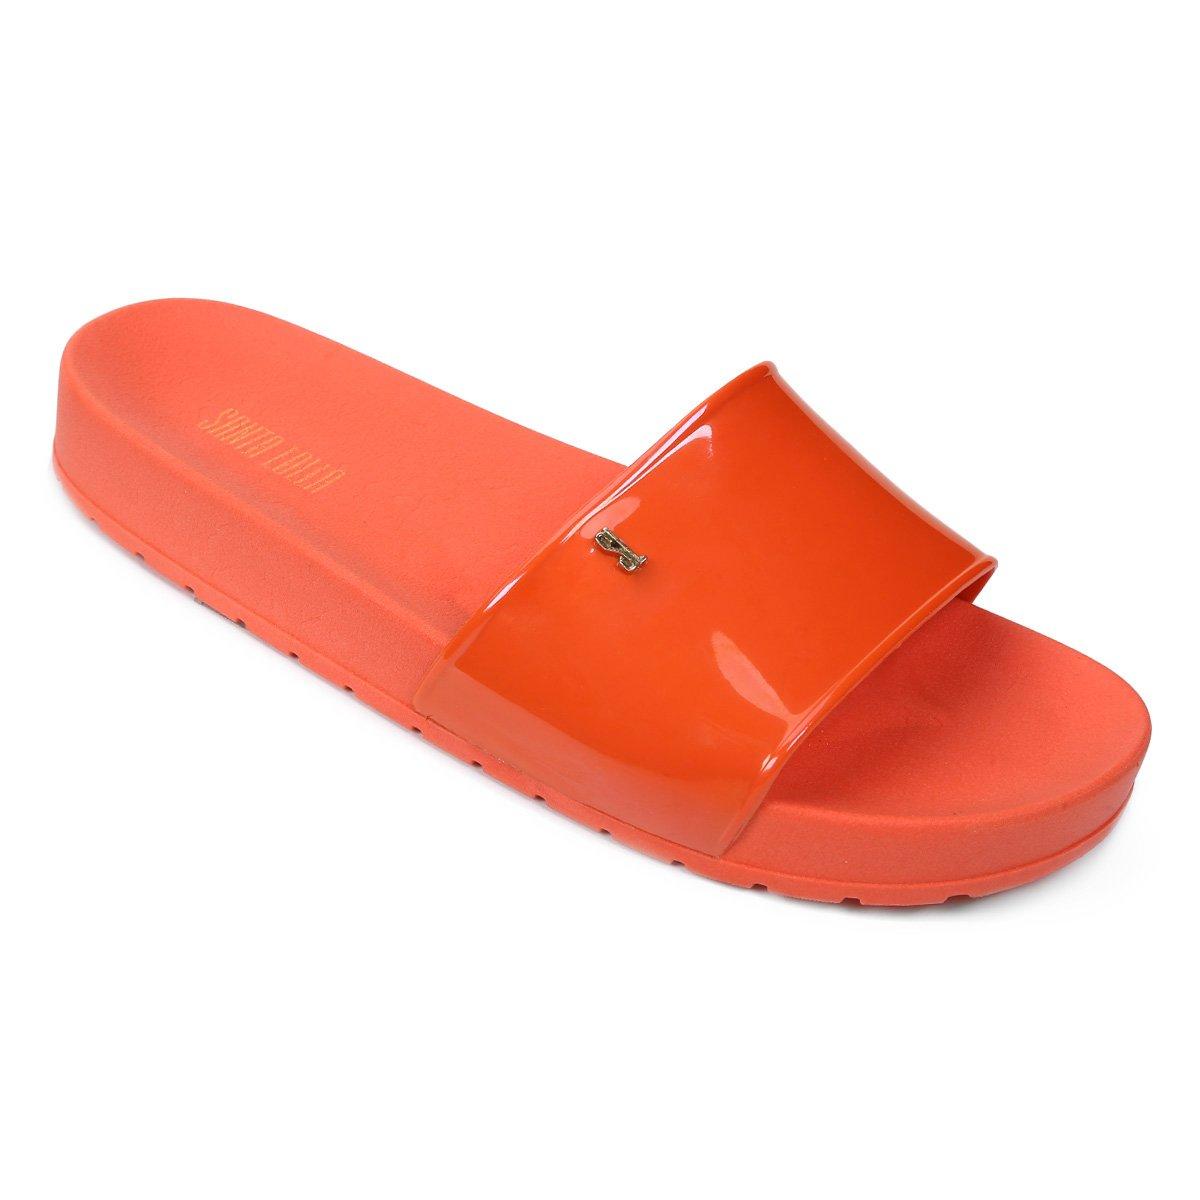 Flip Coral Chinelo Chinelo Santa Lolla Feminino Flop Slide Flip Slide Feminino Lolla Santa Coral Flop PZqw1TCP